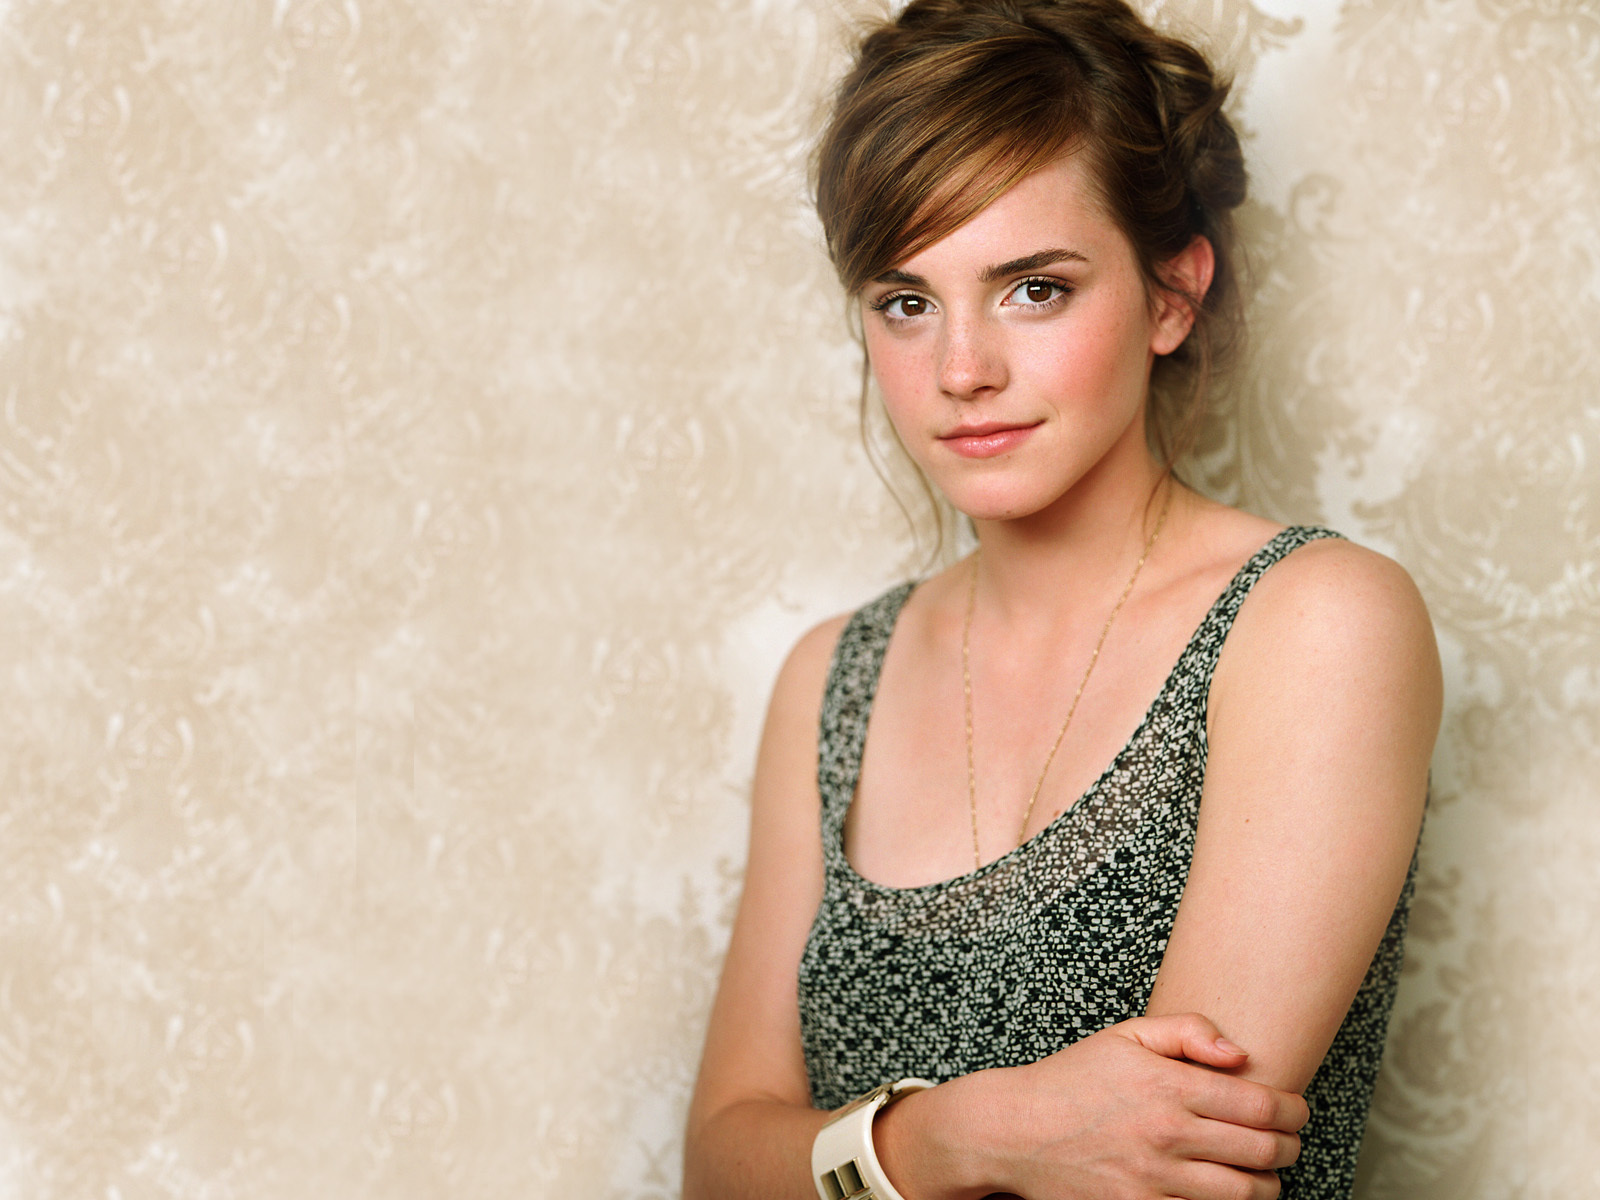 Emma Watson Latest Hd Wallpapers 2013 | subtat